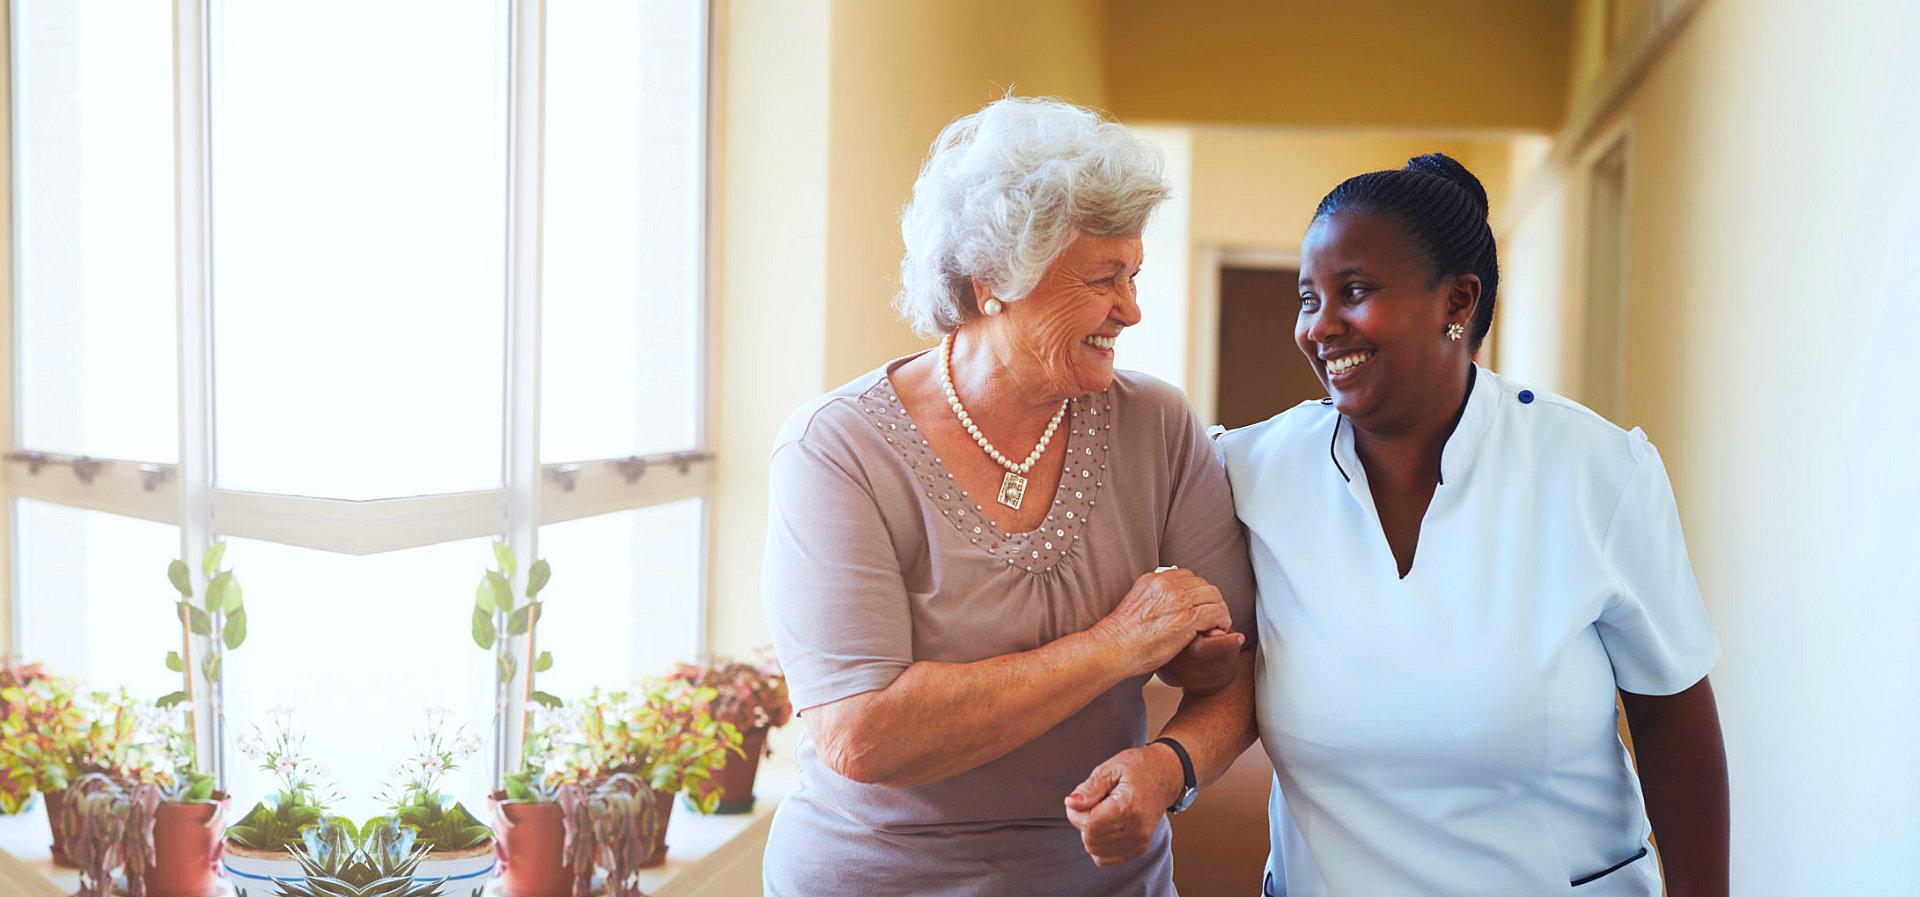 senior woman walking with caregiver